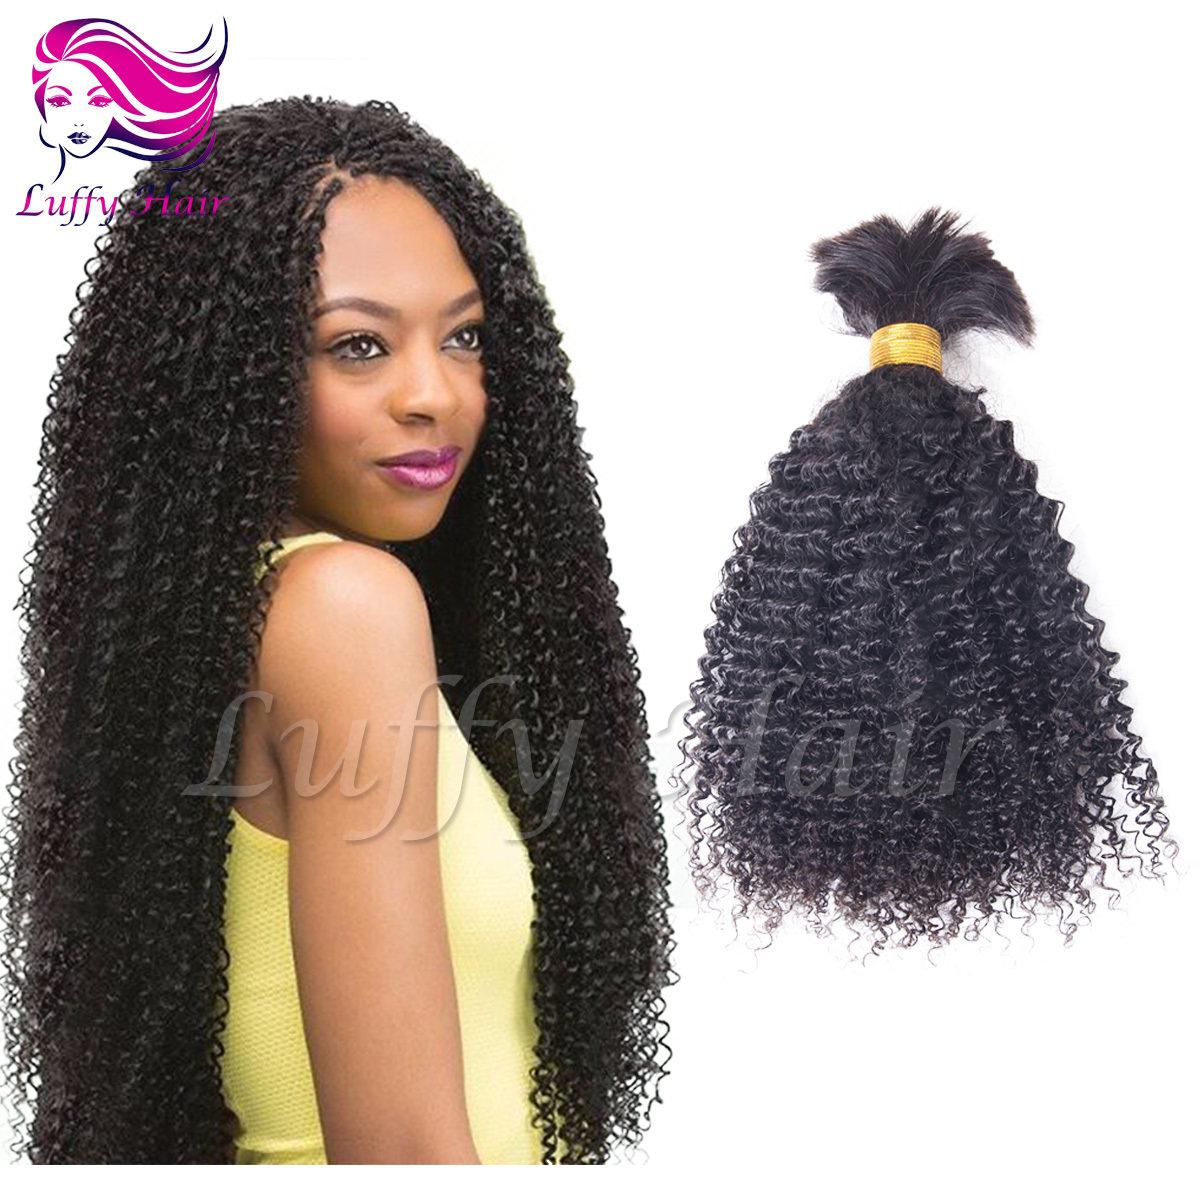 8A Virgin Human Hair Afro Braiding Hair Bulk - KBL002